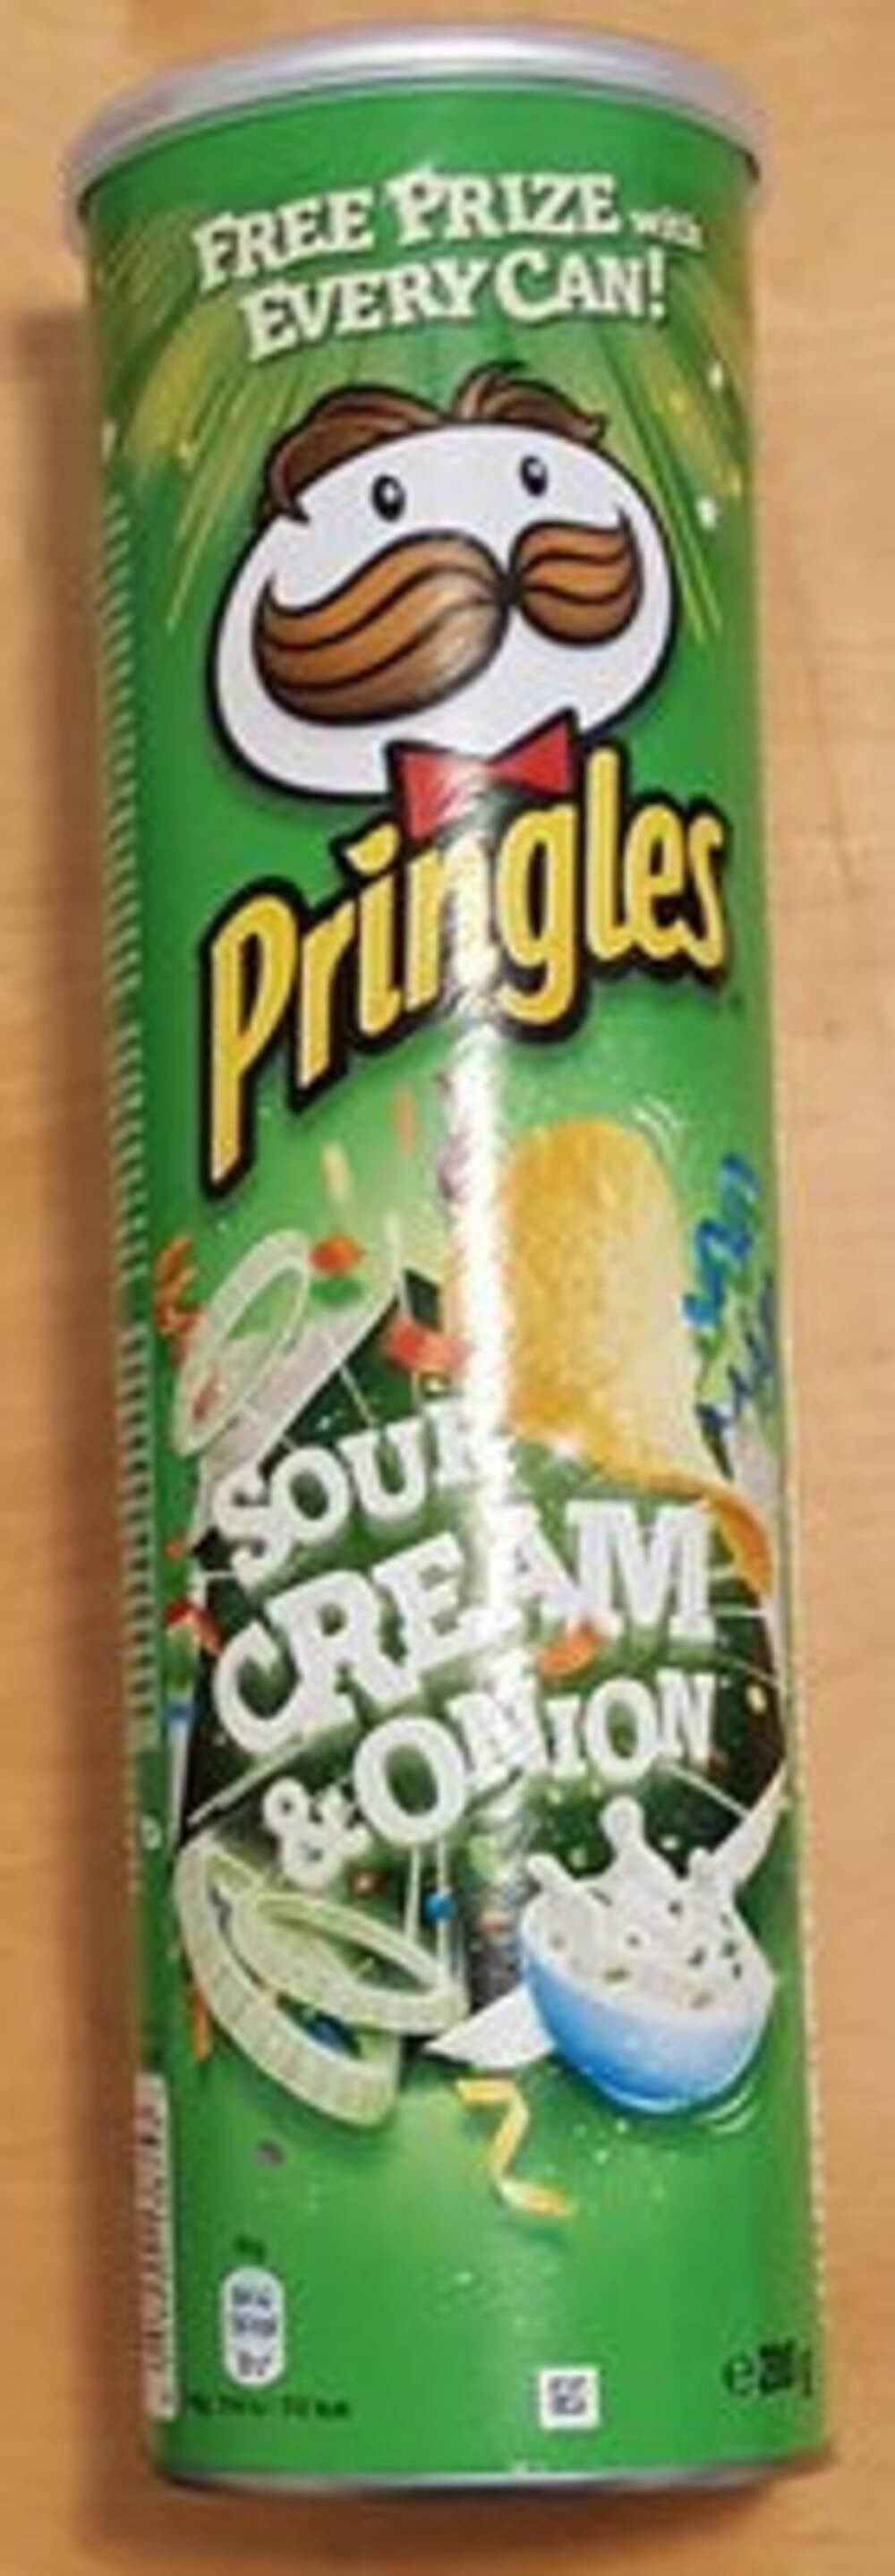 Sour Cream & Onion - نتاج - de